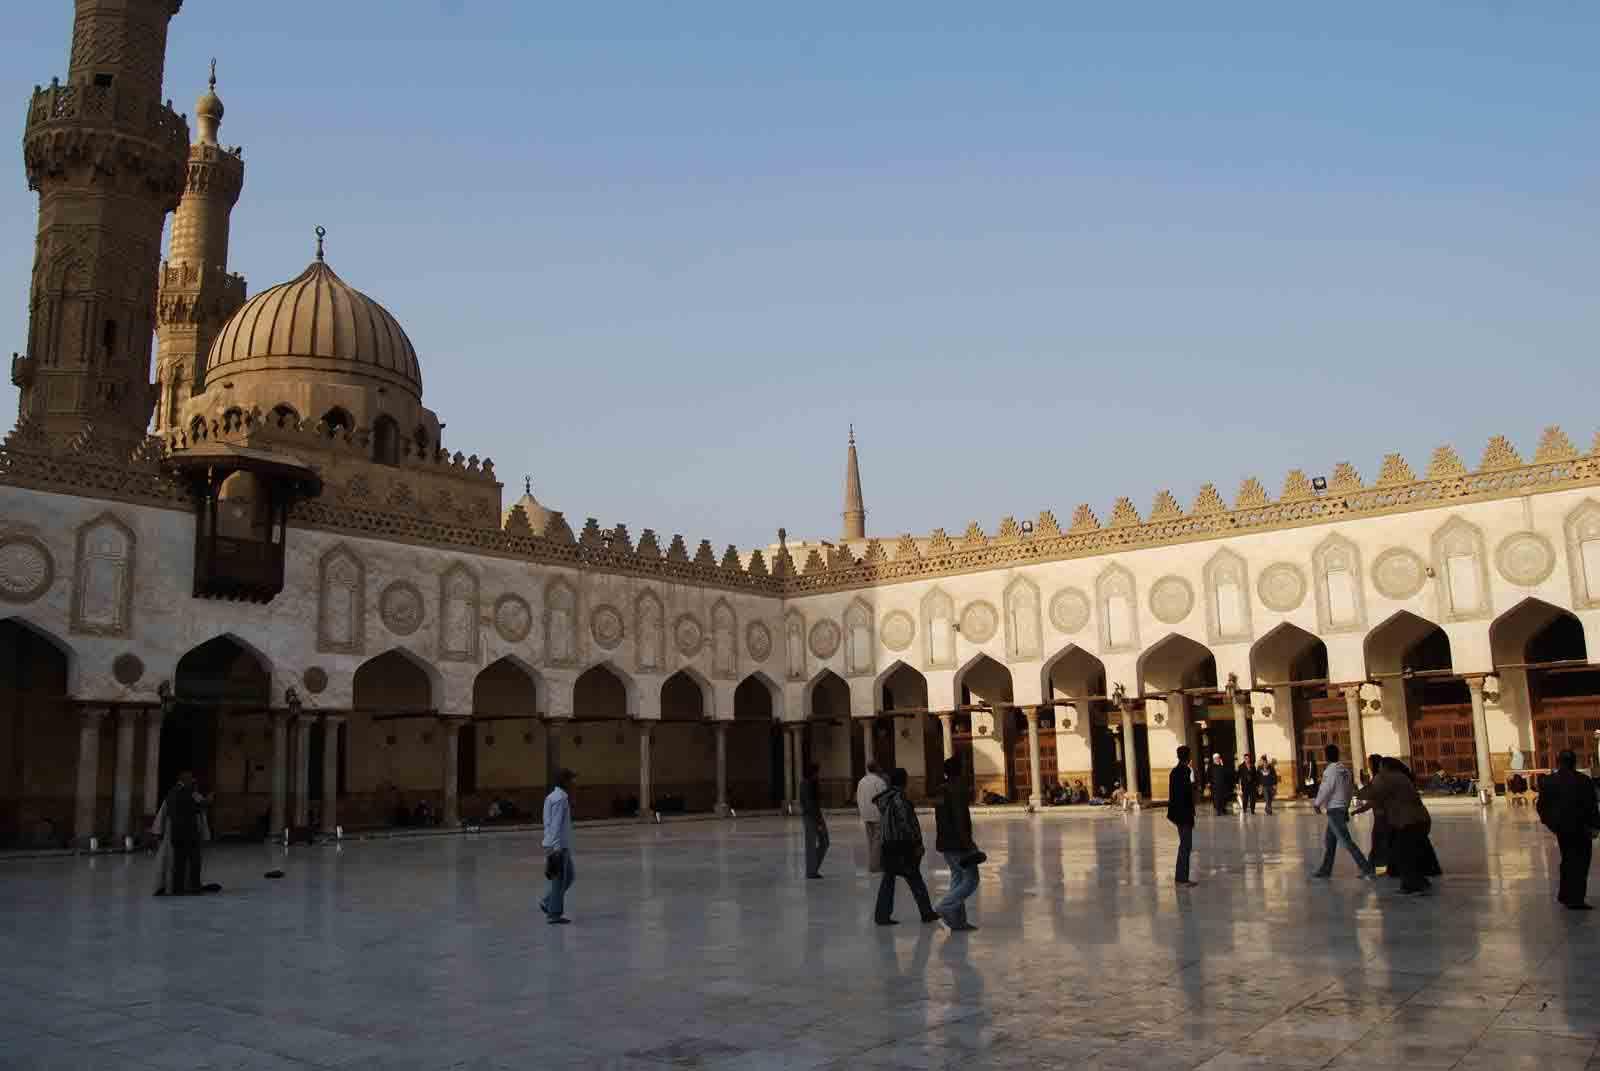 amr ibn el aas mosque in cairo